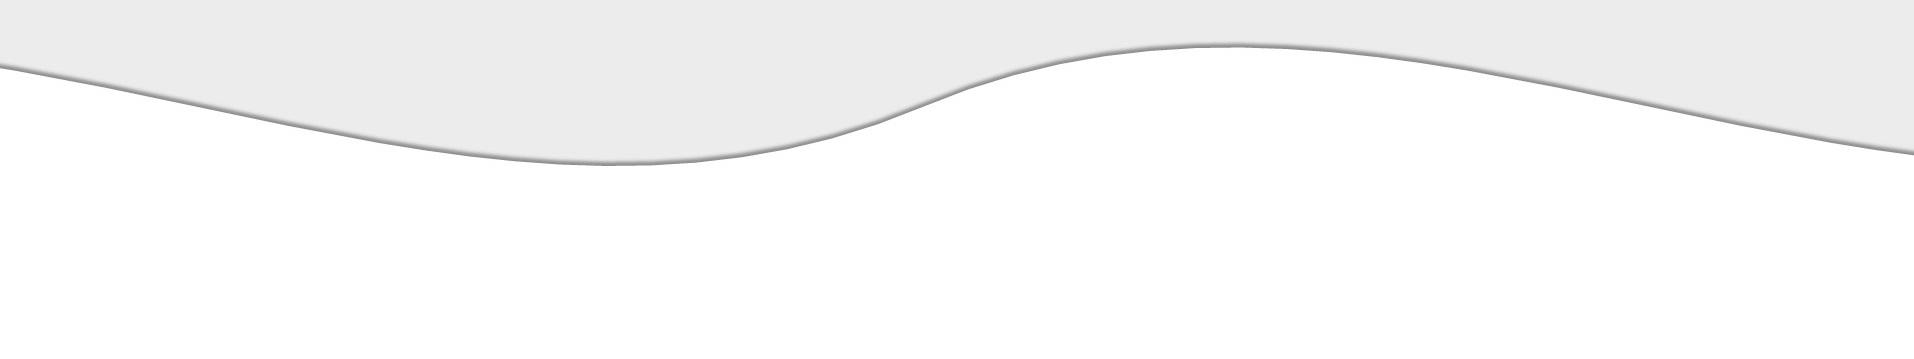 gelomban putih